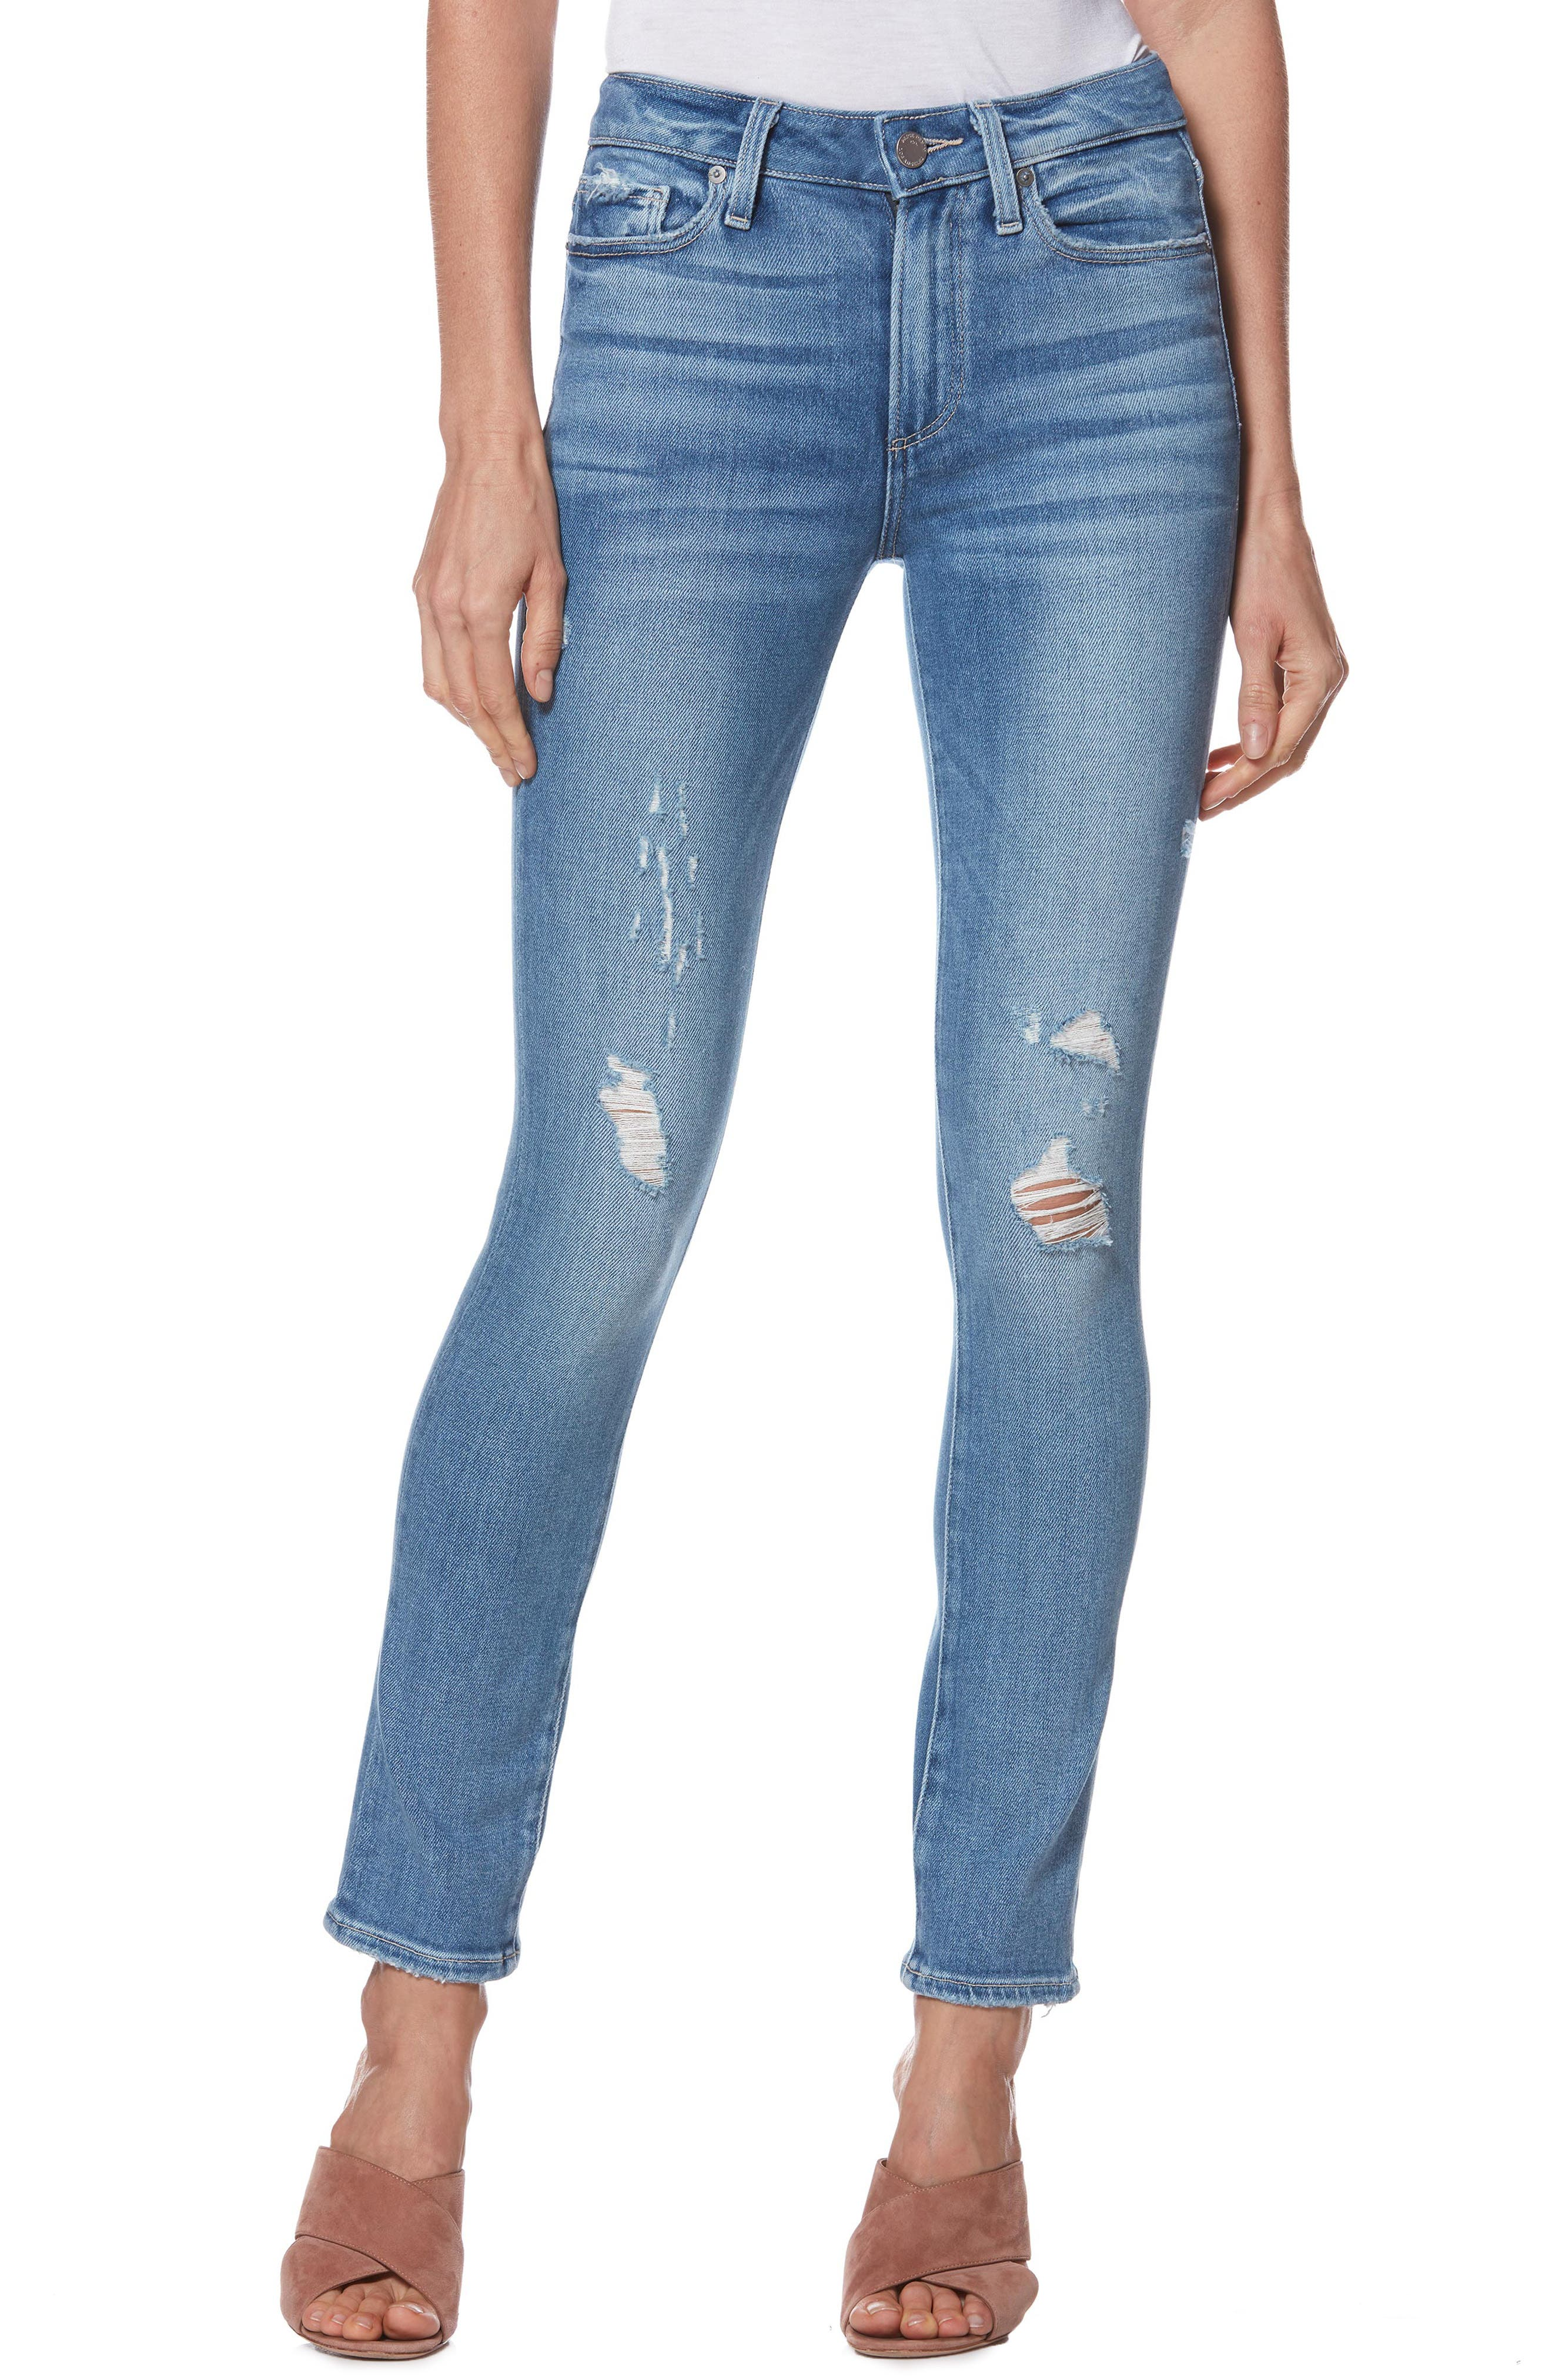 Hoxton High Waist Ankle Peg Jeans,                             Main thumbnail 1, color,                             KAYSON DISTRESSED